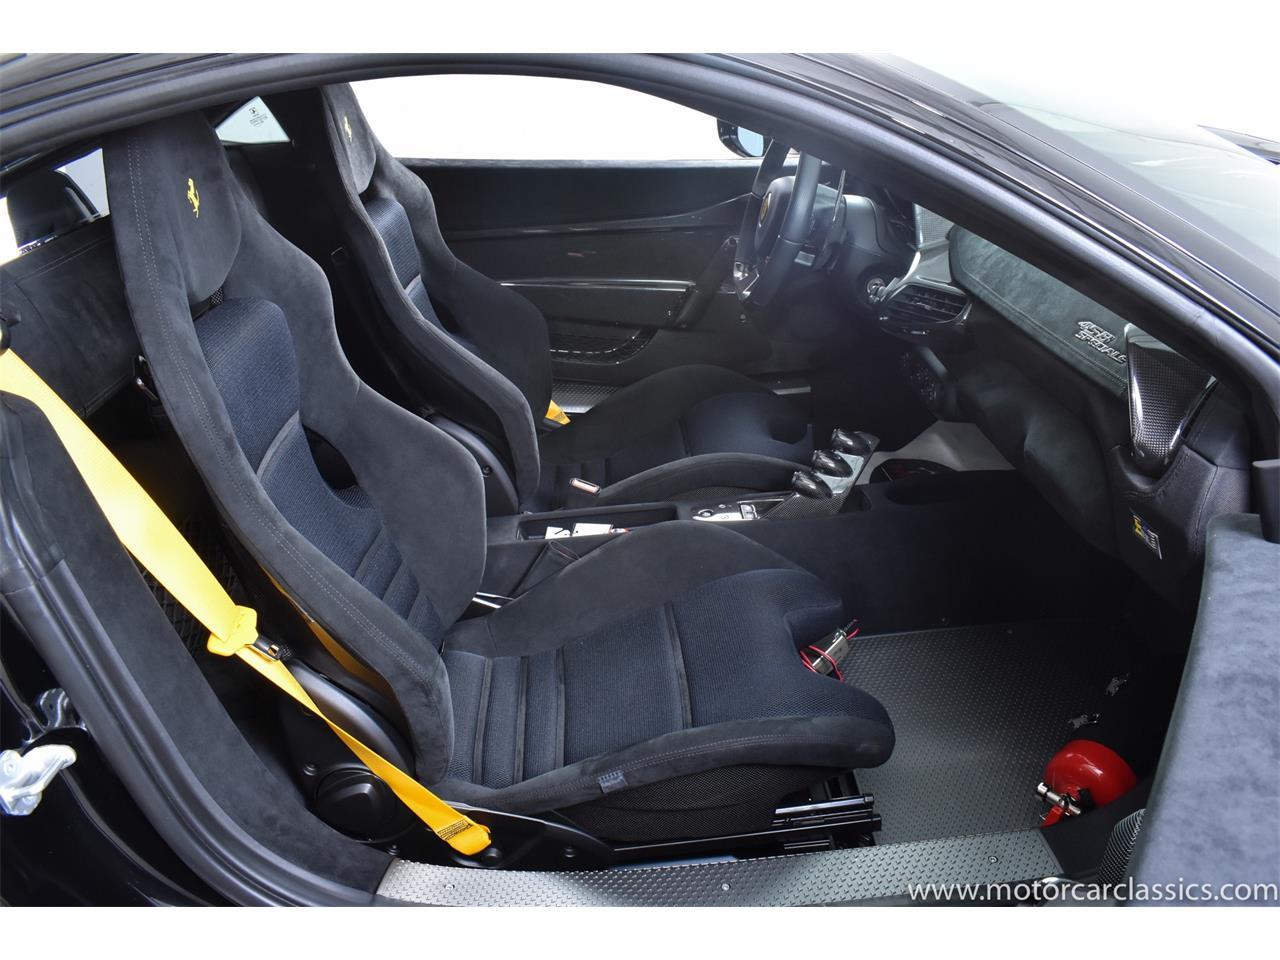 2014 Ferrari 458 (CC-1273729) for sale in Farmingdale, New York